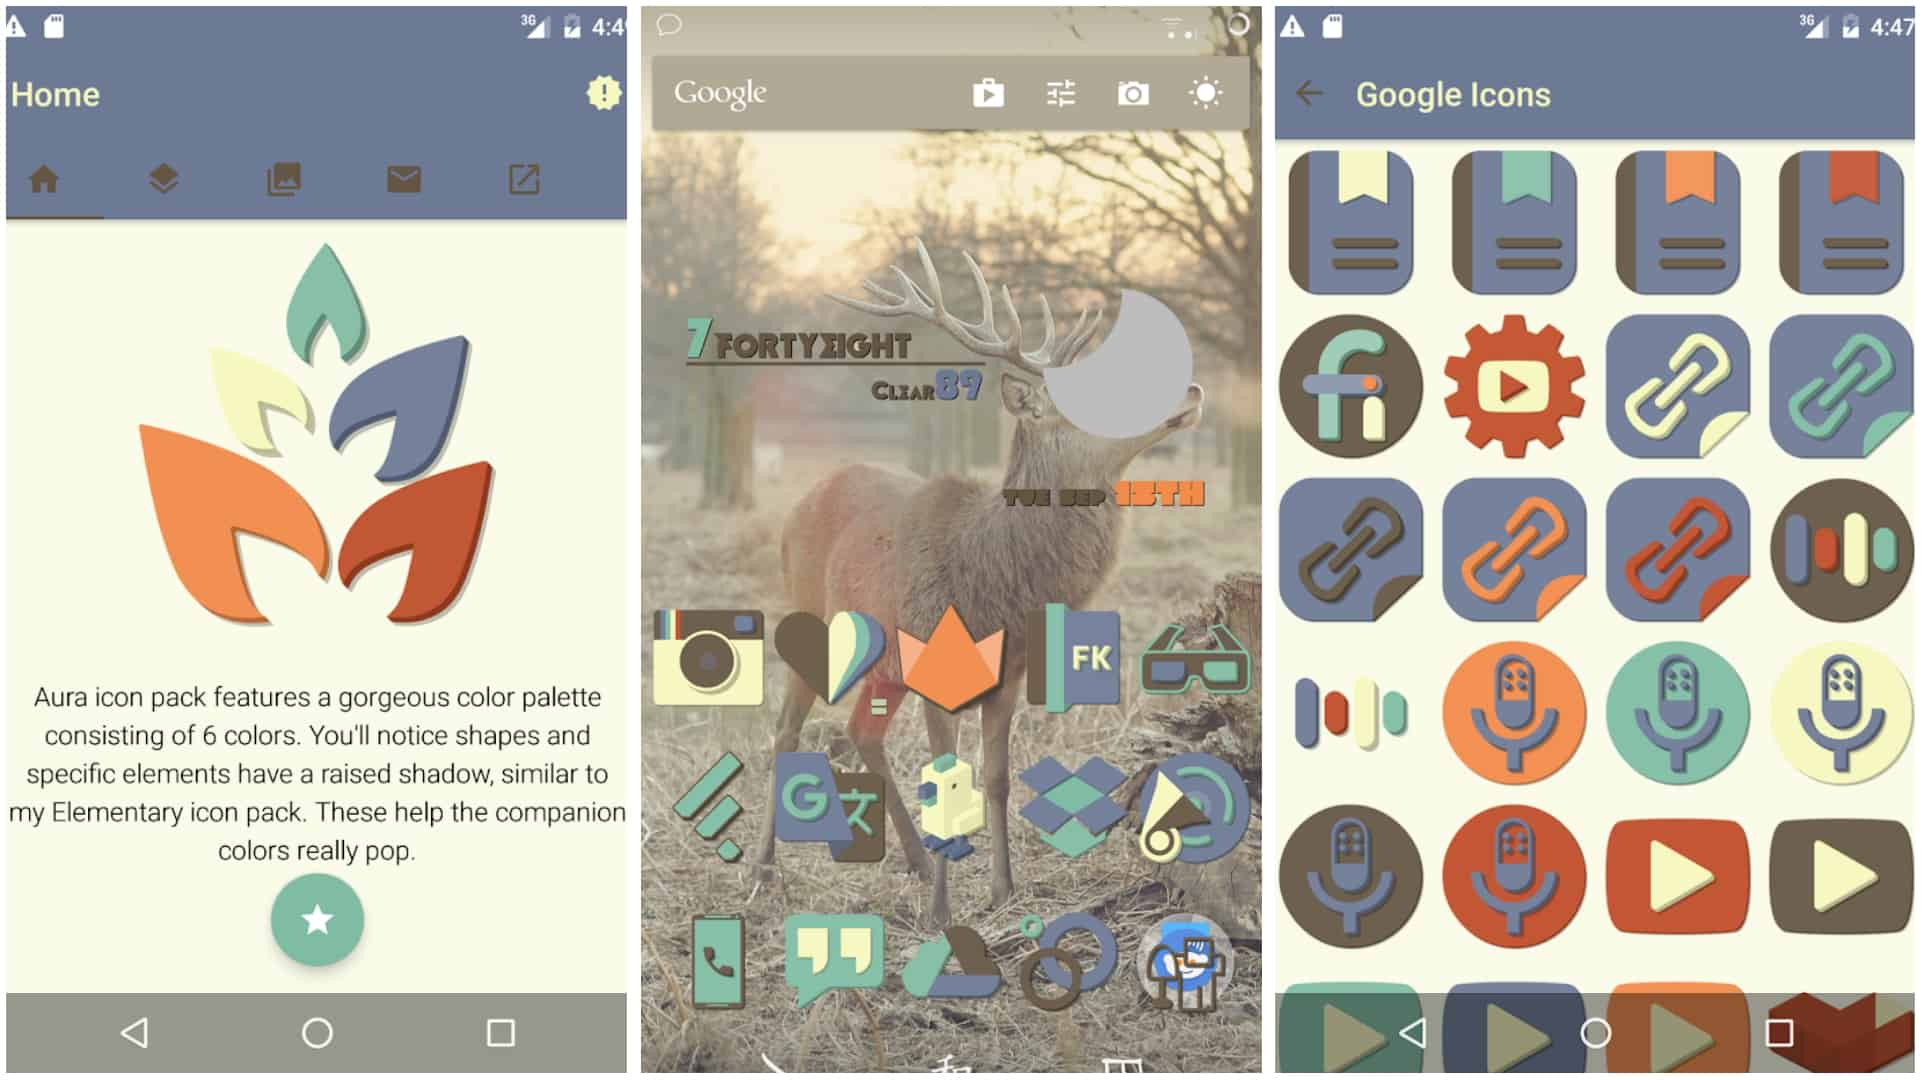 Aura Icon Pack app grid image